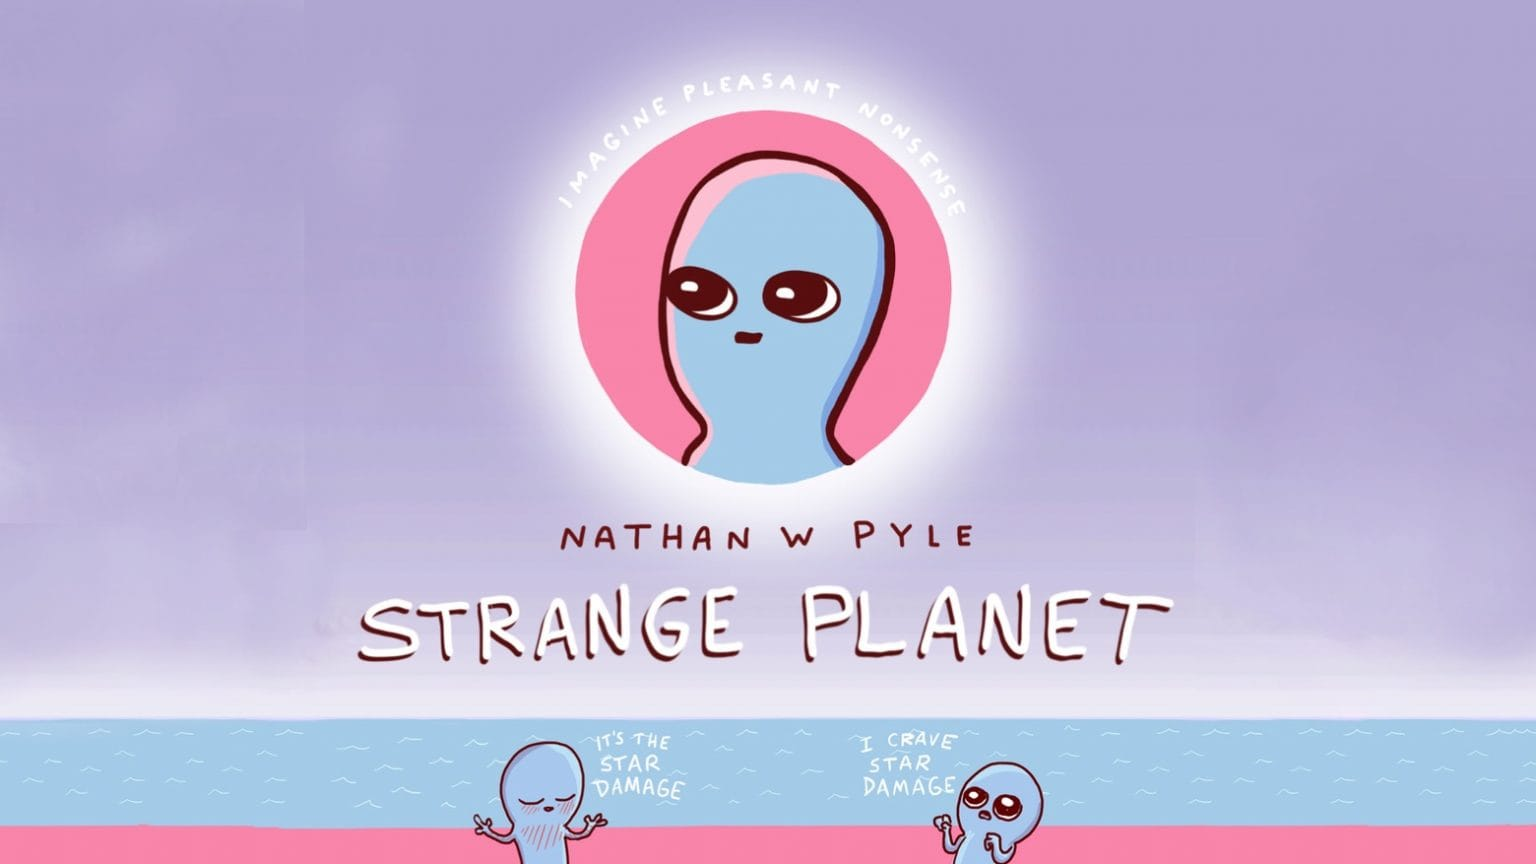 Apple TV+ prepares a visit to Nathan Pyle's whimsical 'Strange Planet'